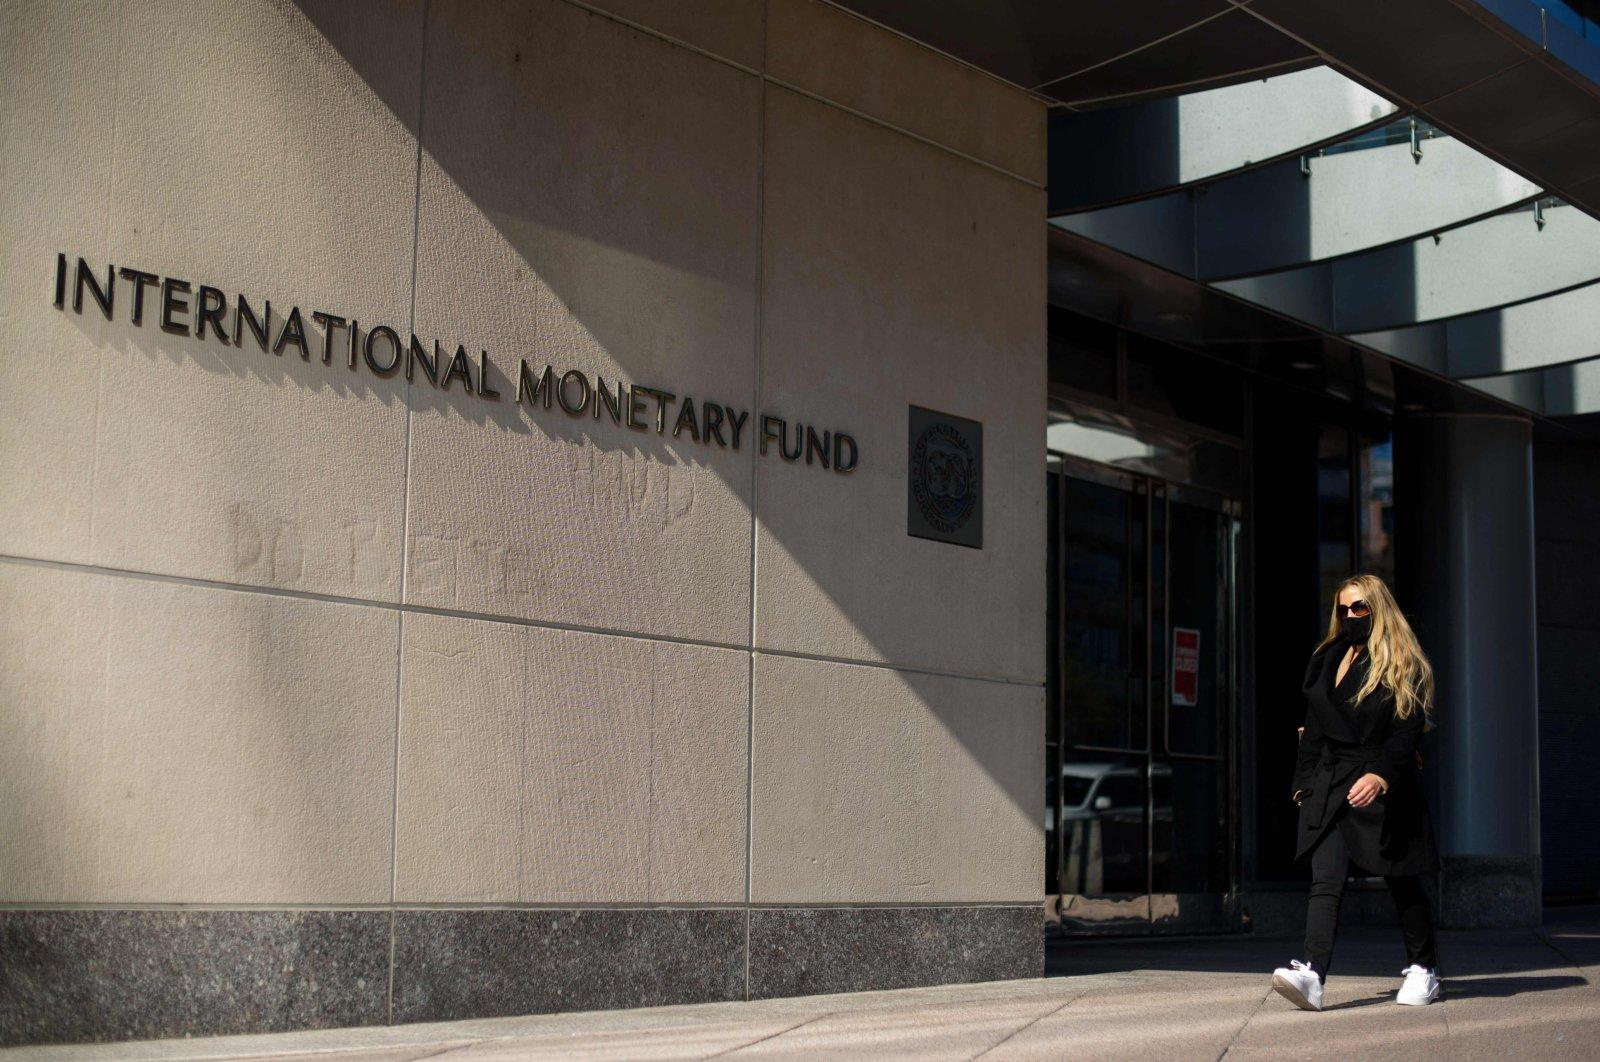 International Monetary Fund (IMF) headquarters in Washington, D.C., April 5, 2021. (AFP Photo)